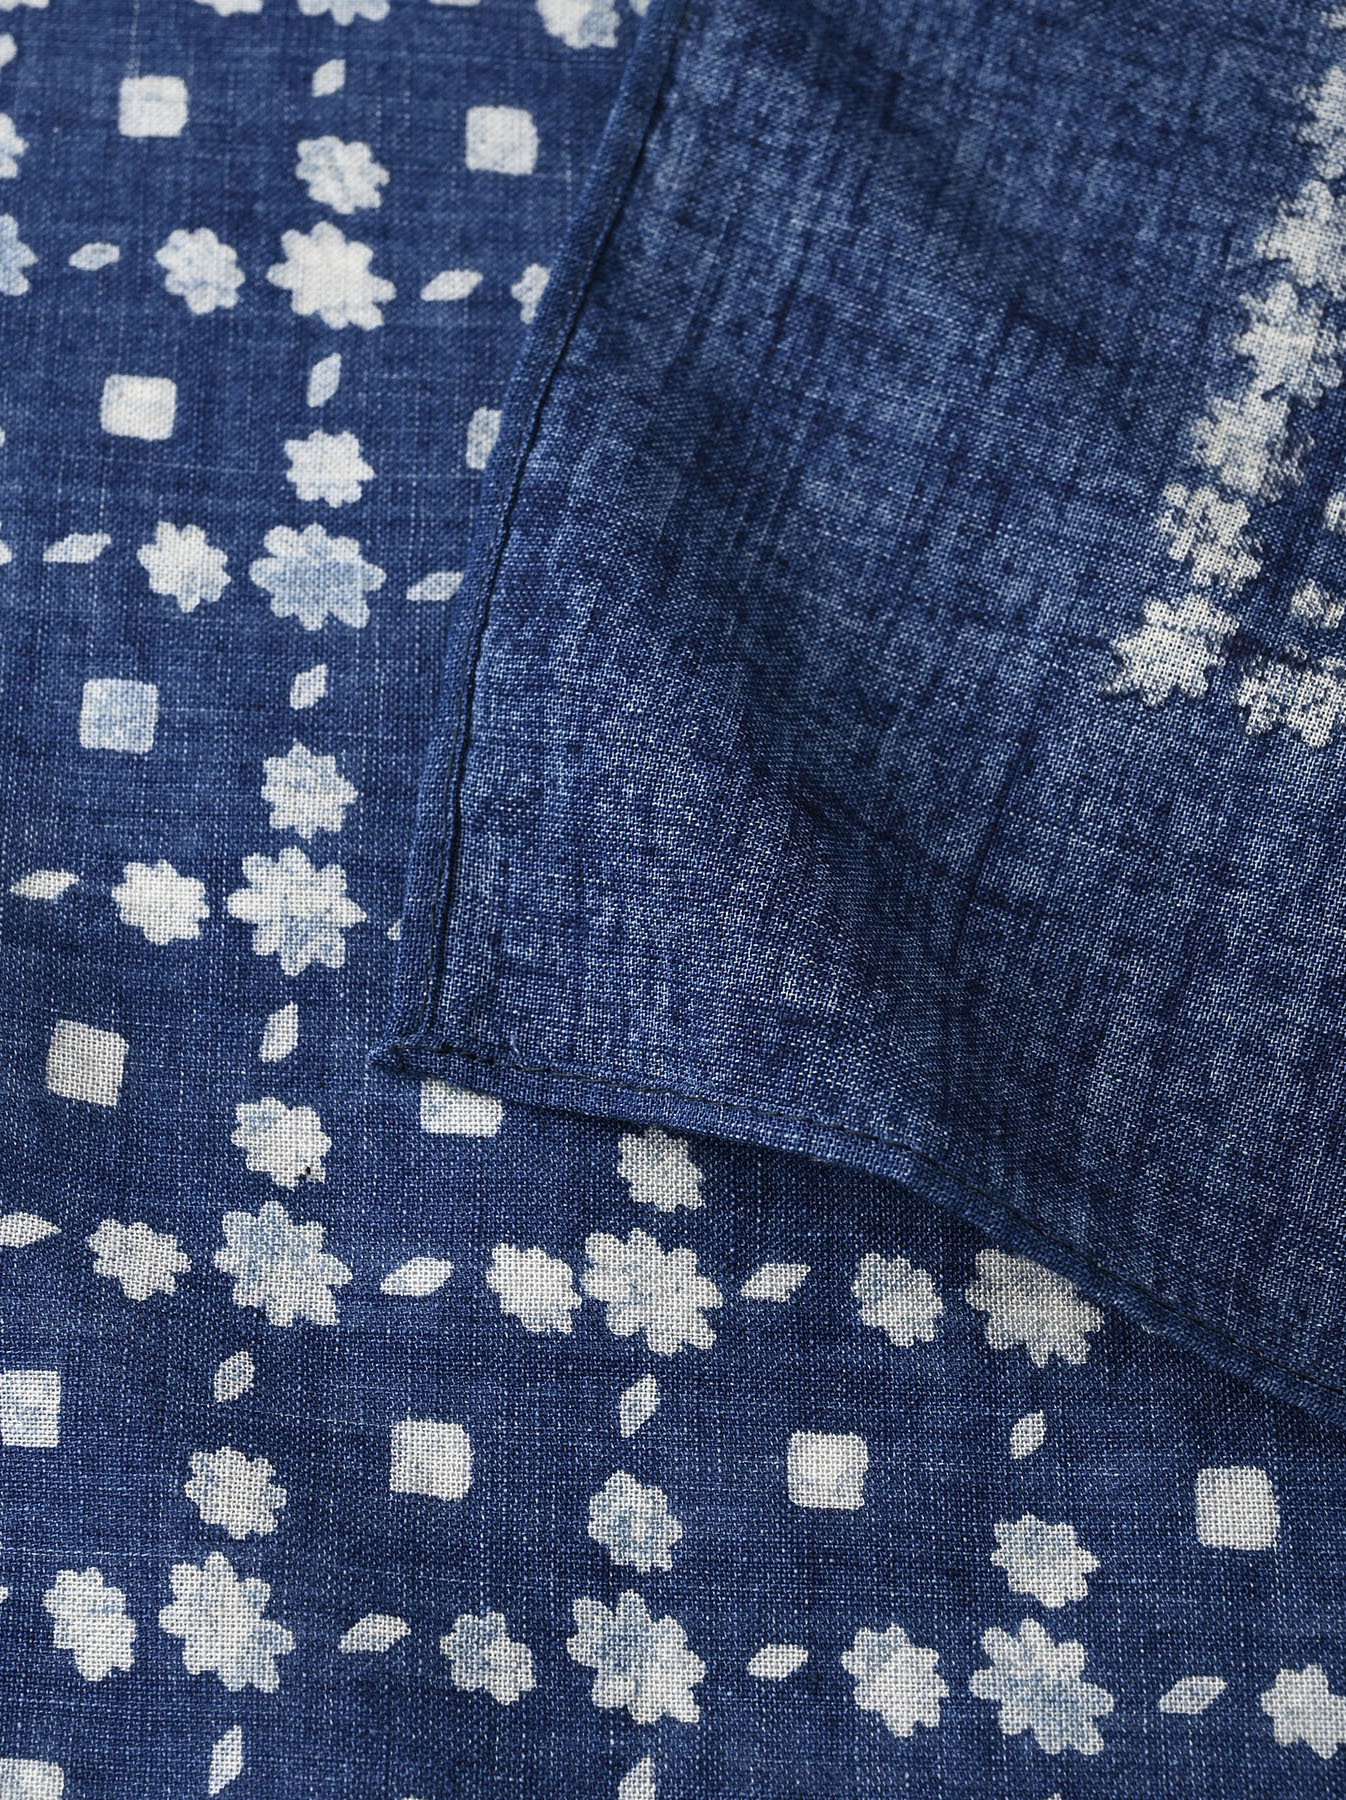 Indigo Selvedge Flower Check Bandana (0621)-8